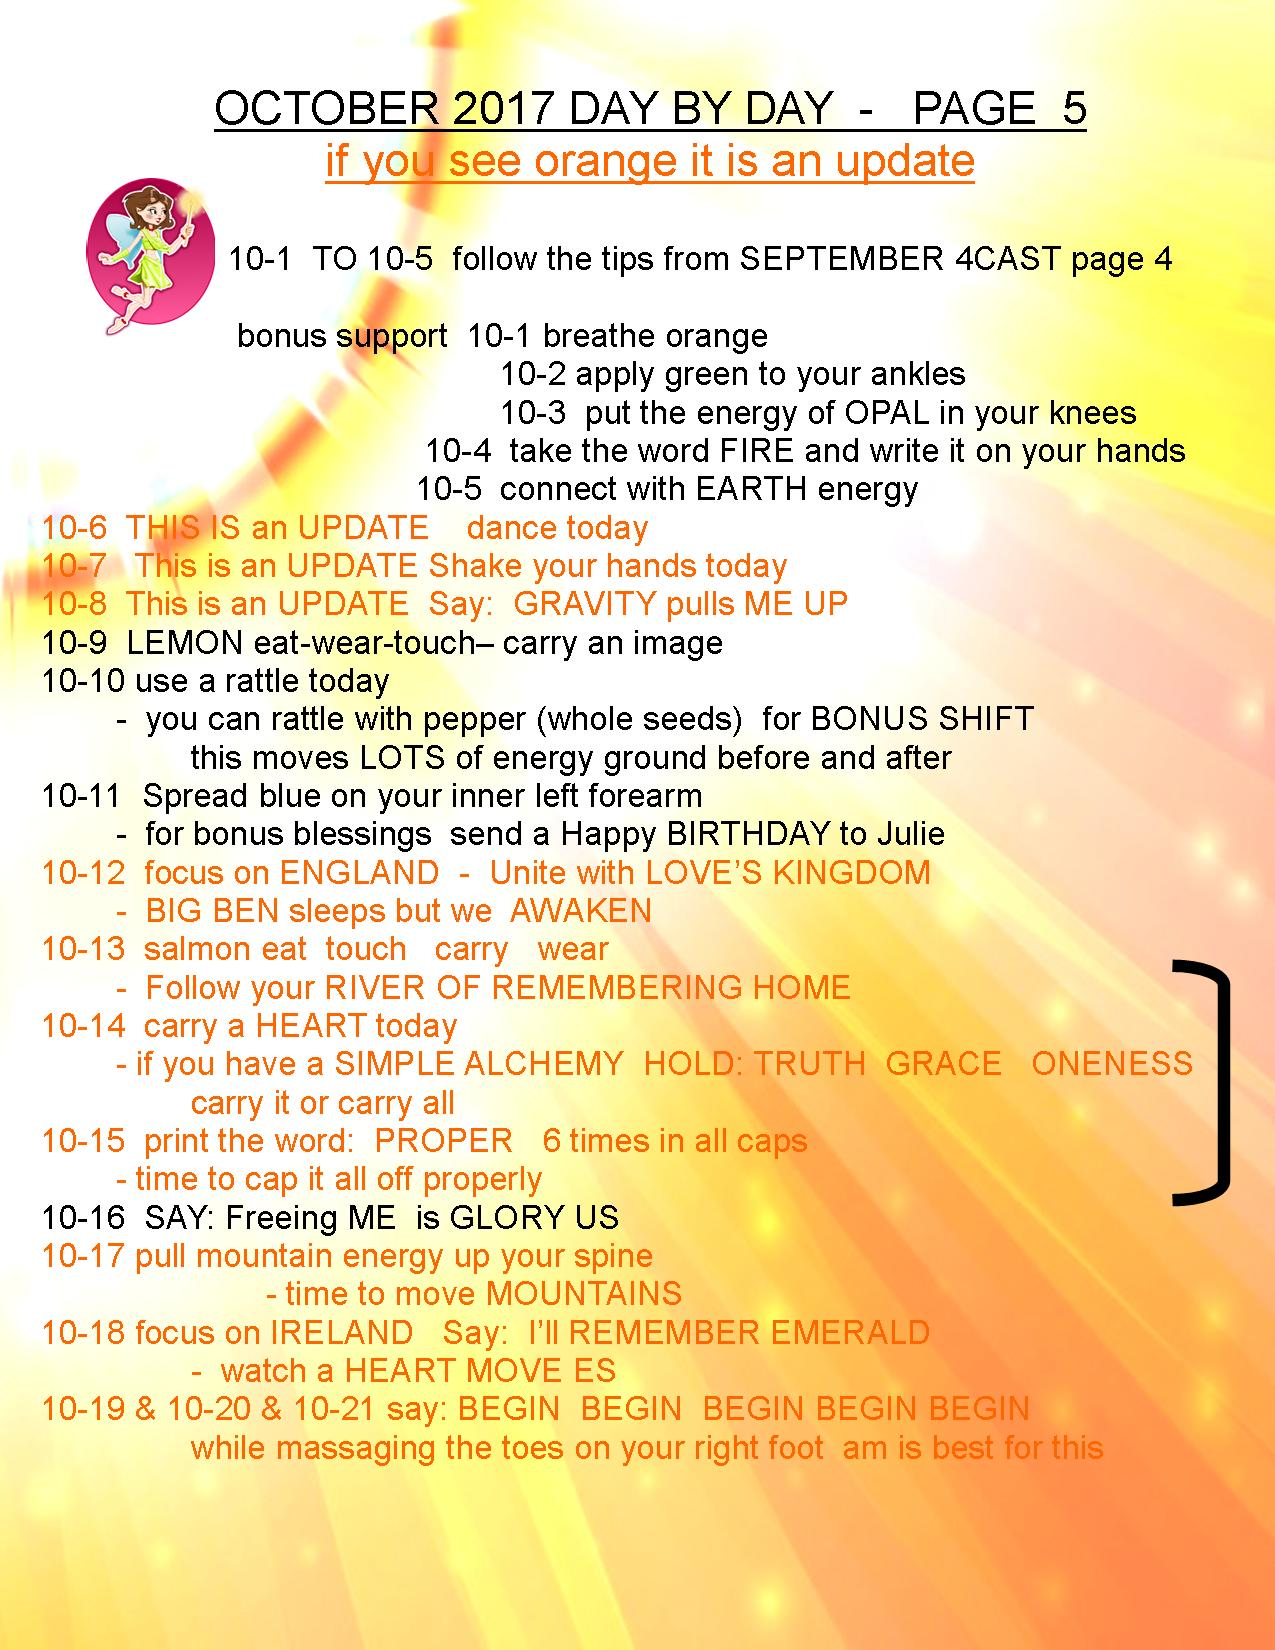 OCTOBER 2017 4CAST PAGE 5 PEG